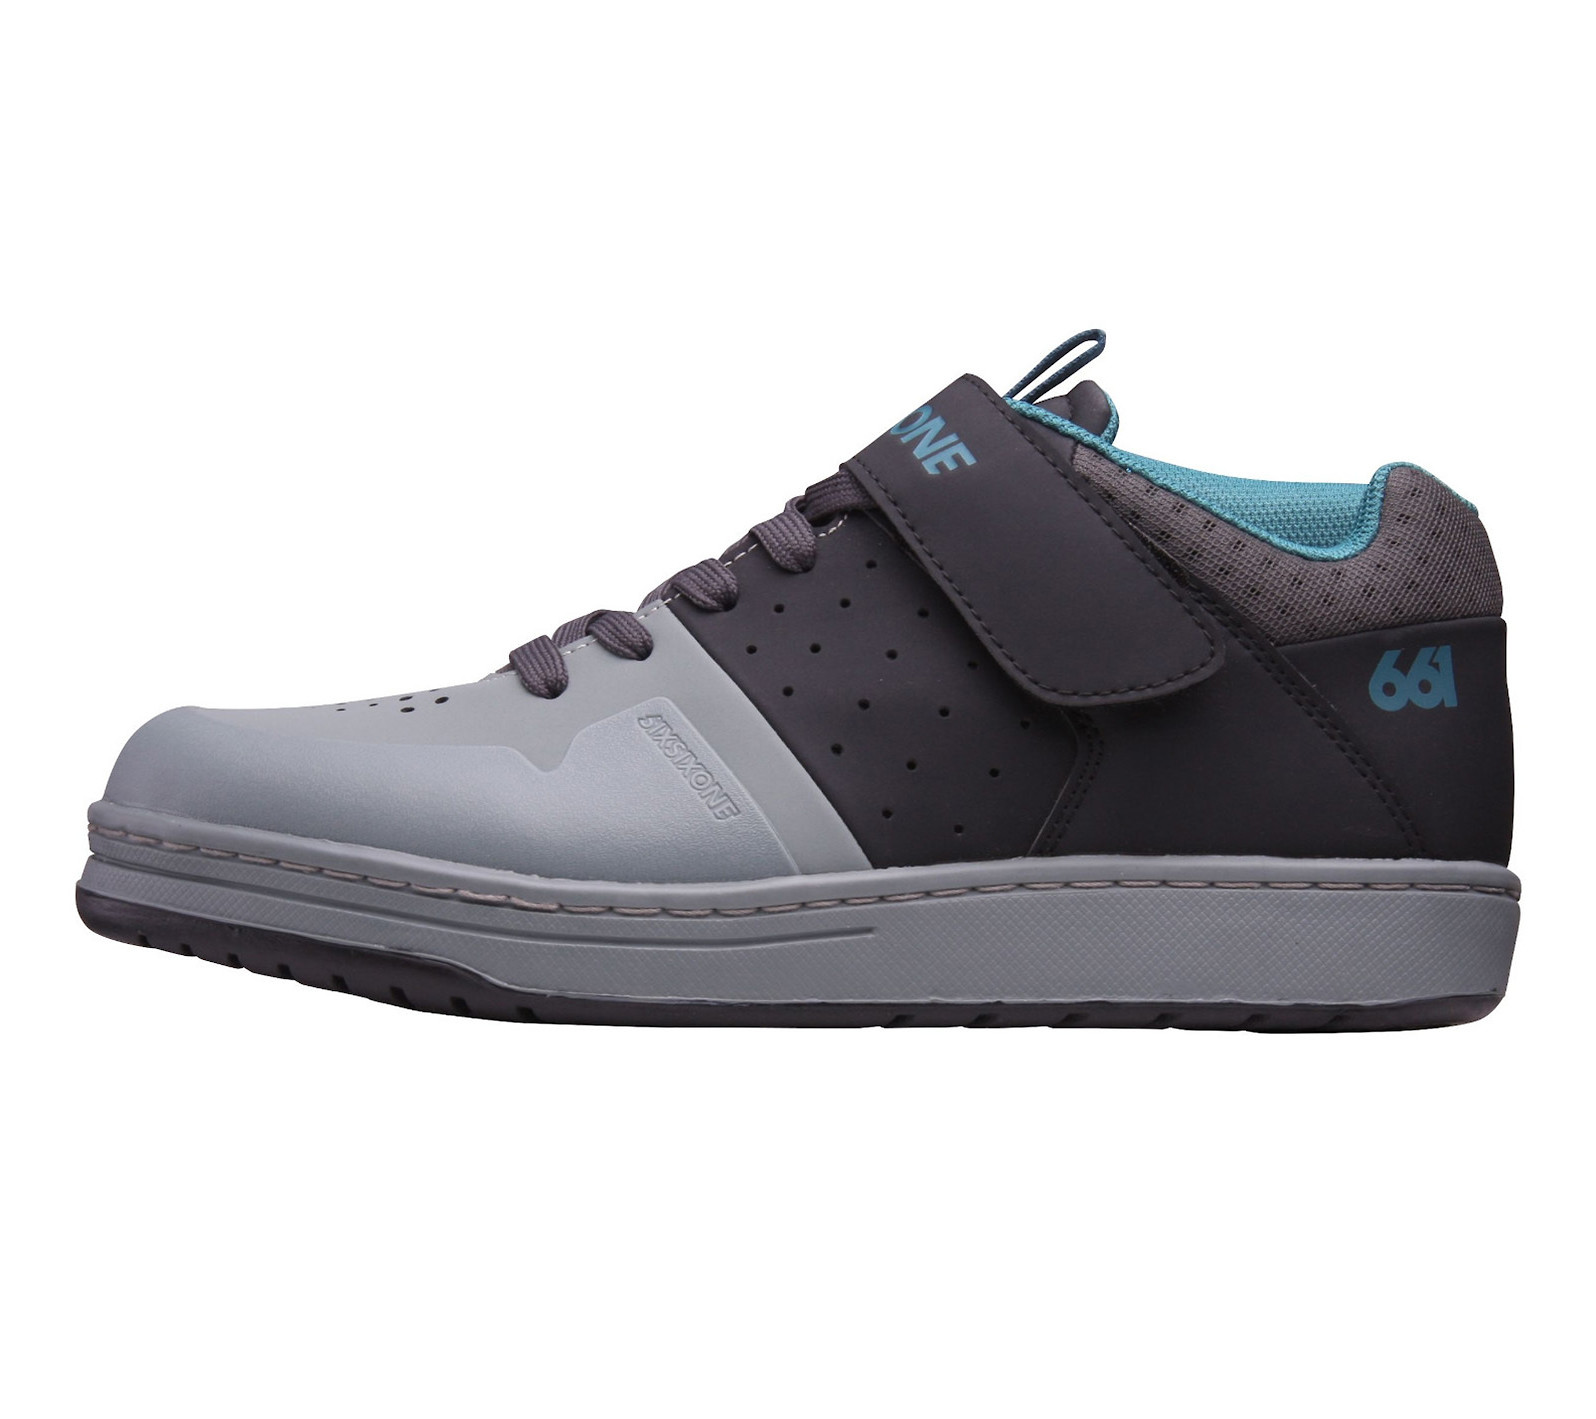 SixSixOne Filter SPD shoe in Gray